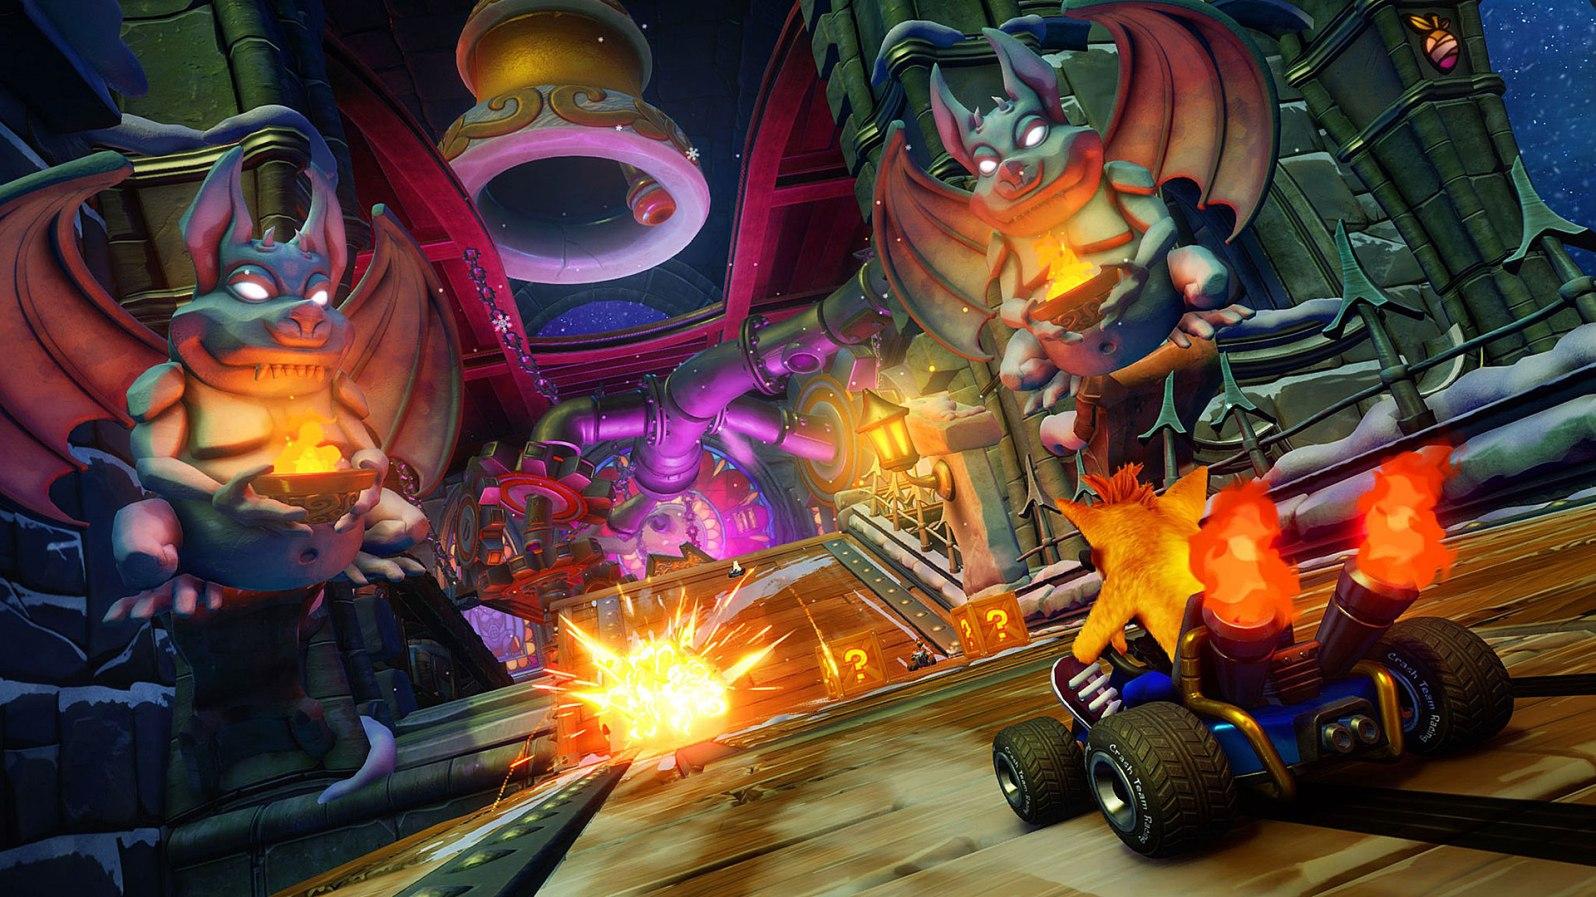 Quelle: Twitter/@CrashBandicoot - Crash Team Racing Nitro-Fueled